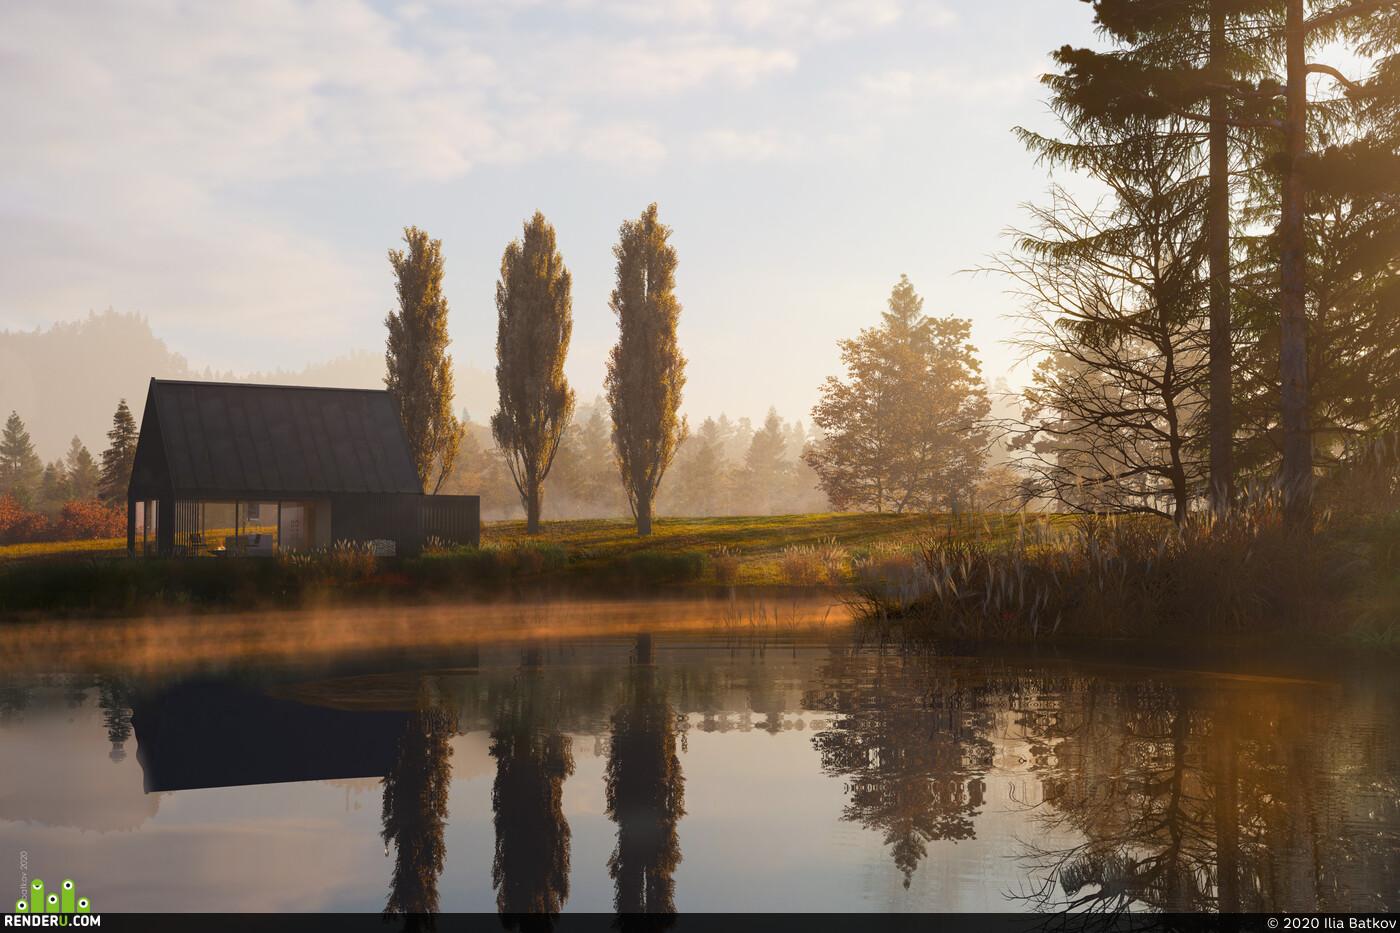 3ds Max, carona render, V-ray, landscape, Exterior